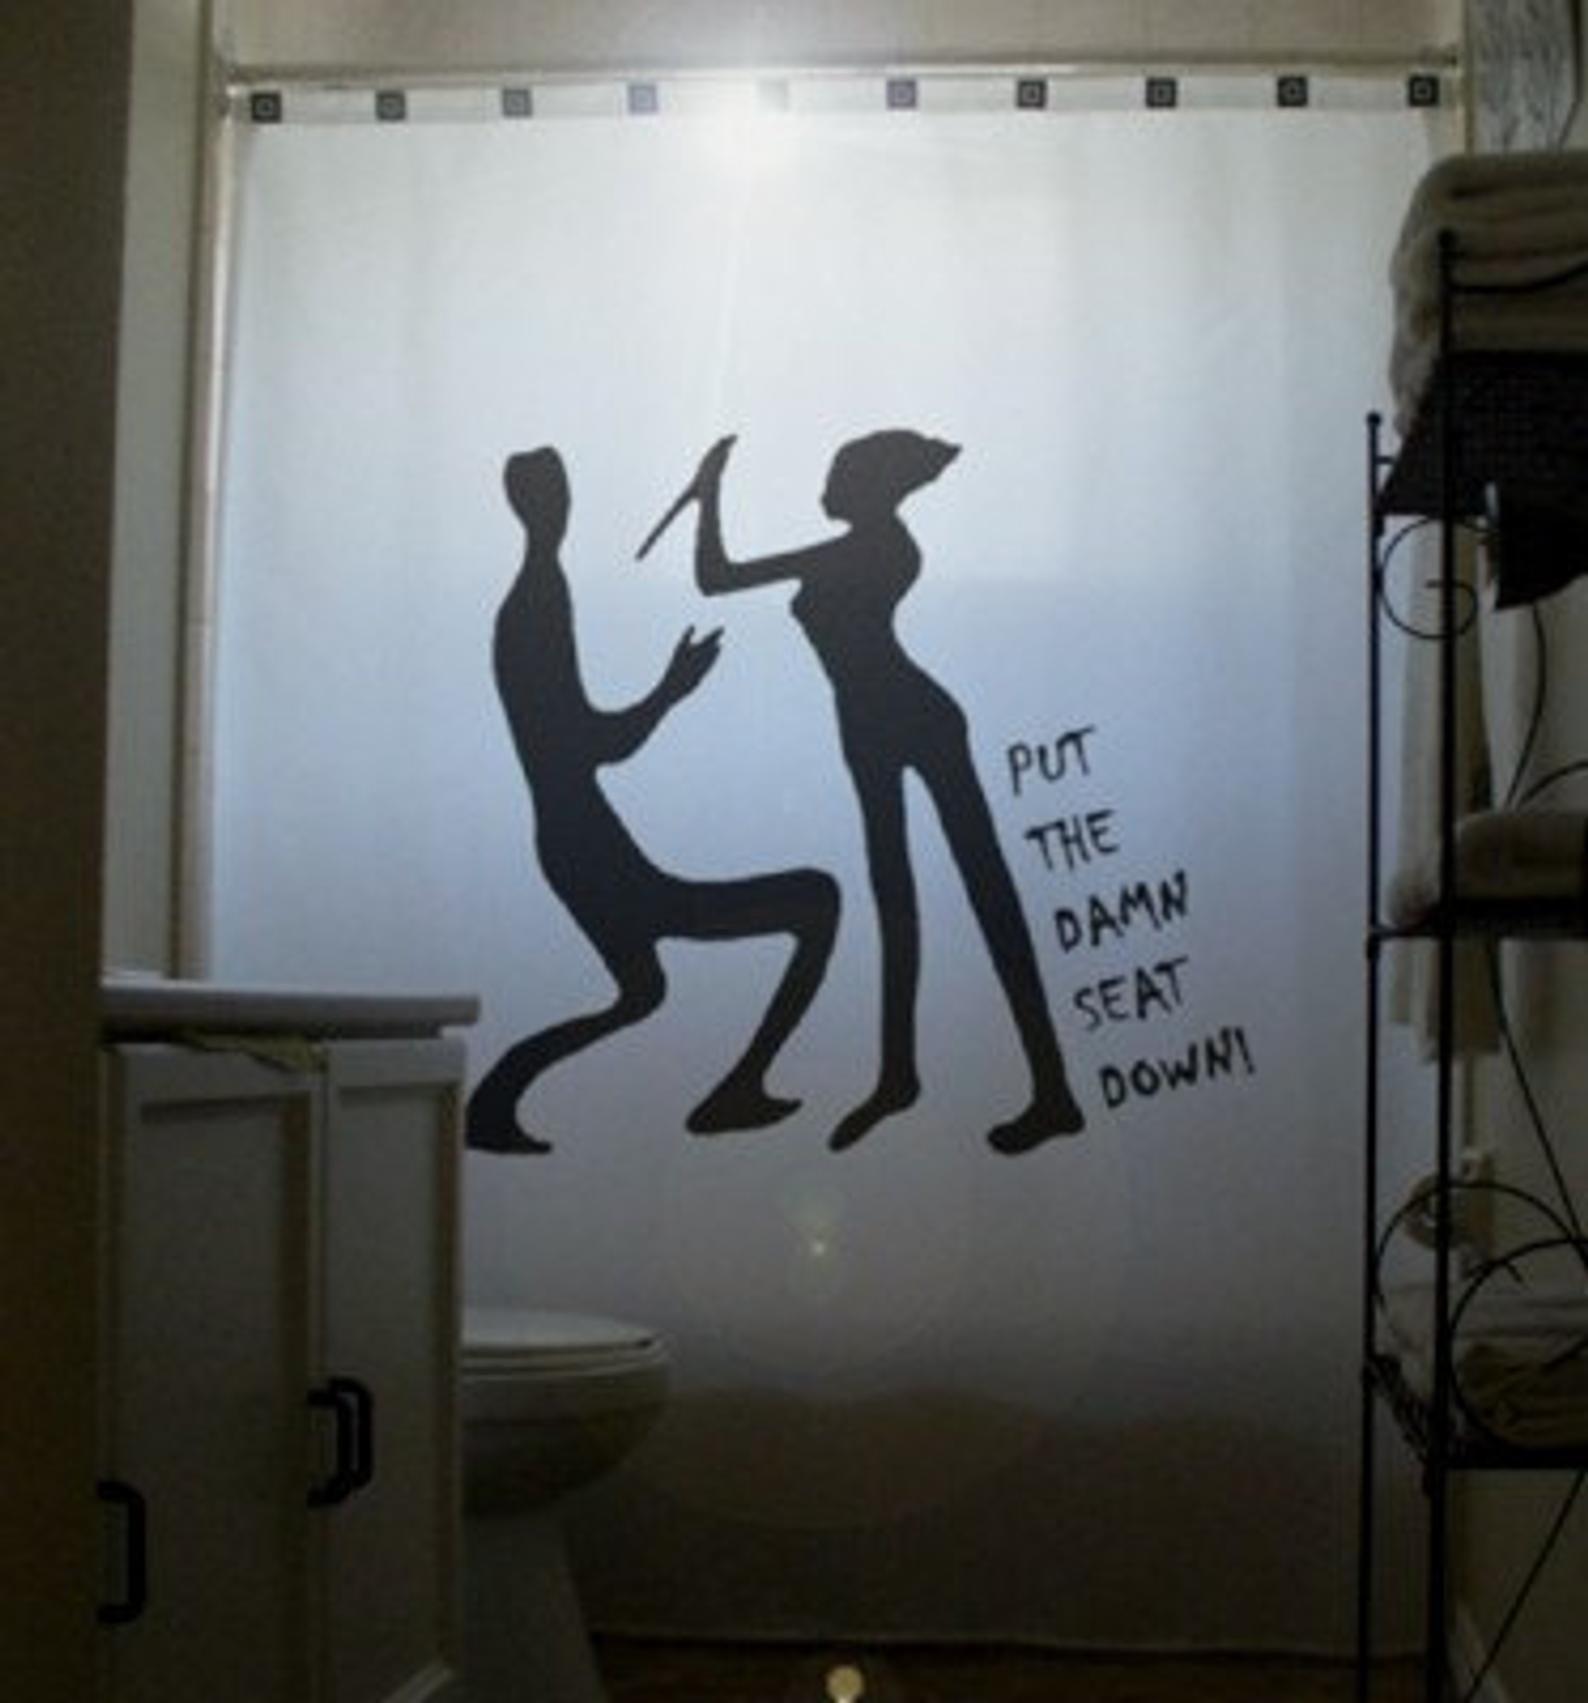 Men Vs Women Funny Shower Curtain Cool Psycho Bathroom Decor Put